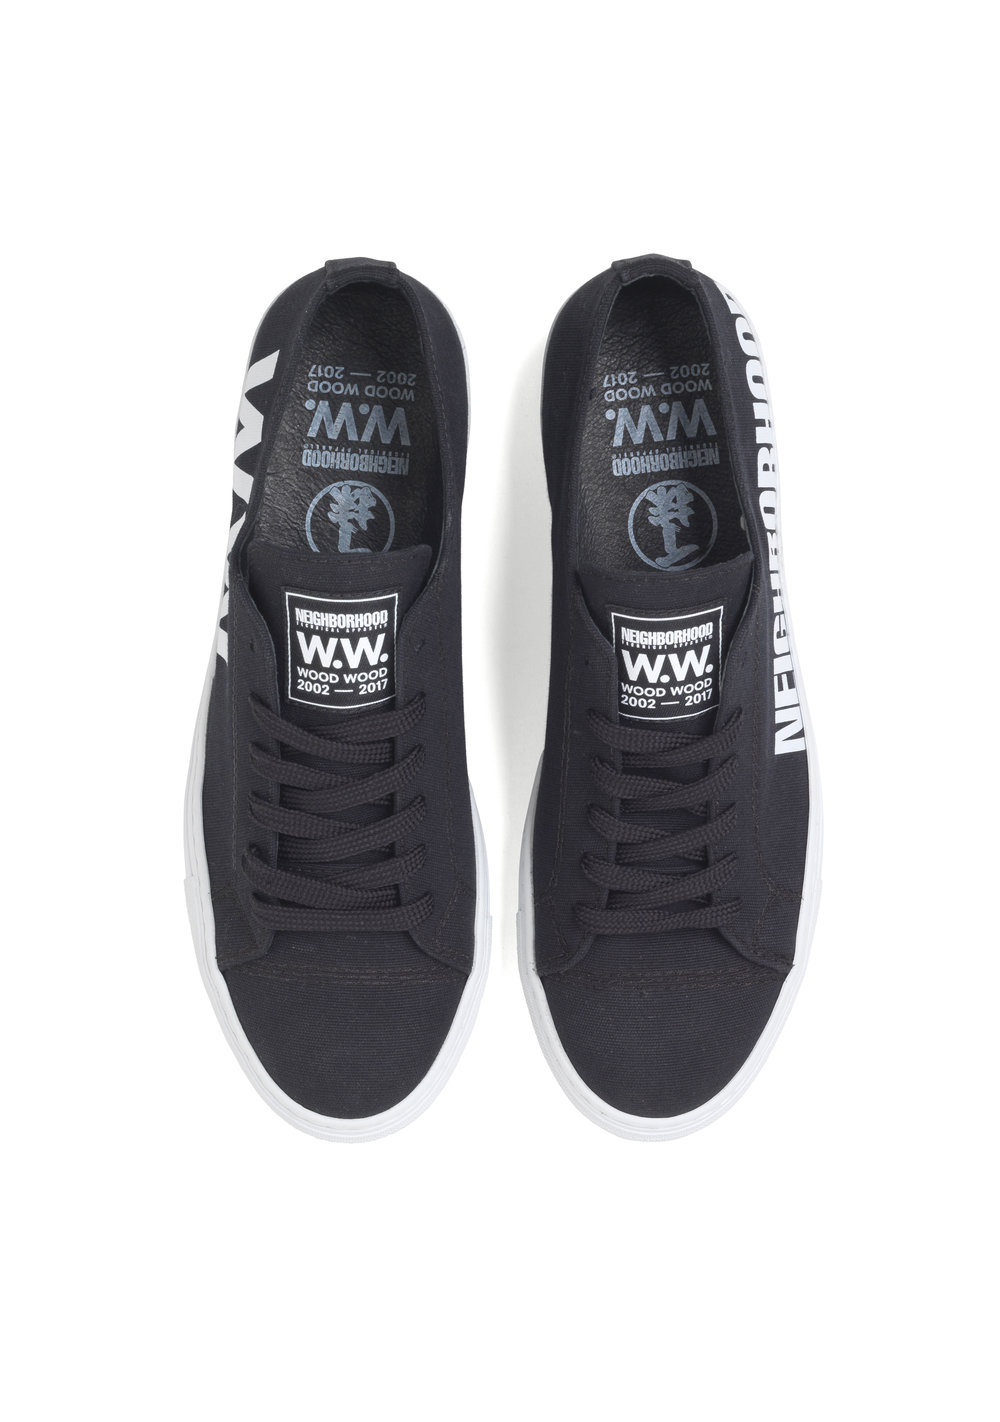 WoodWood_Alex shoes_Black_Up.jpg